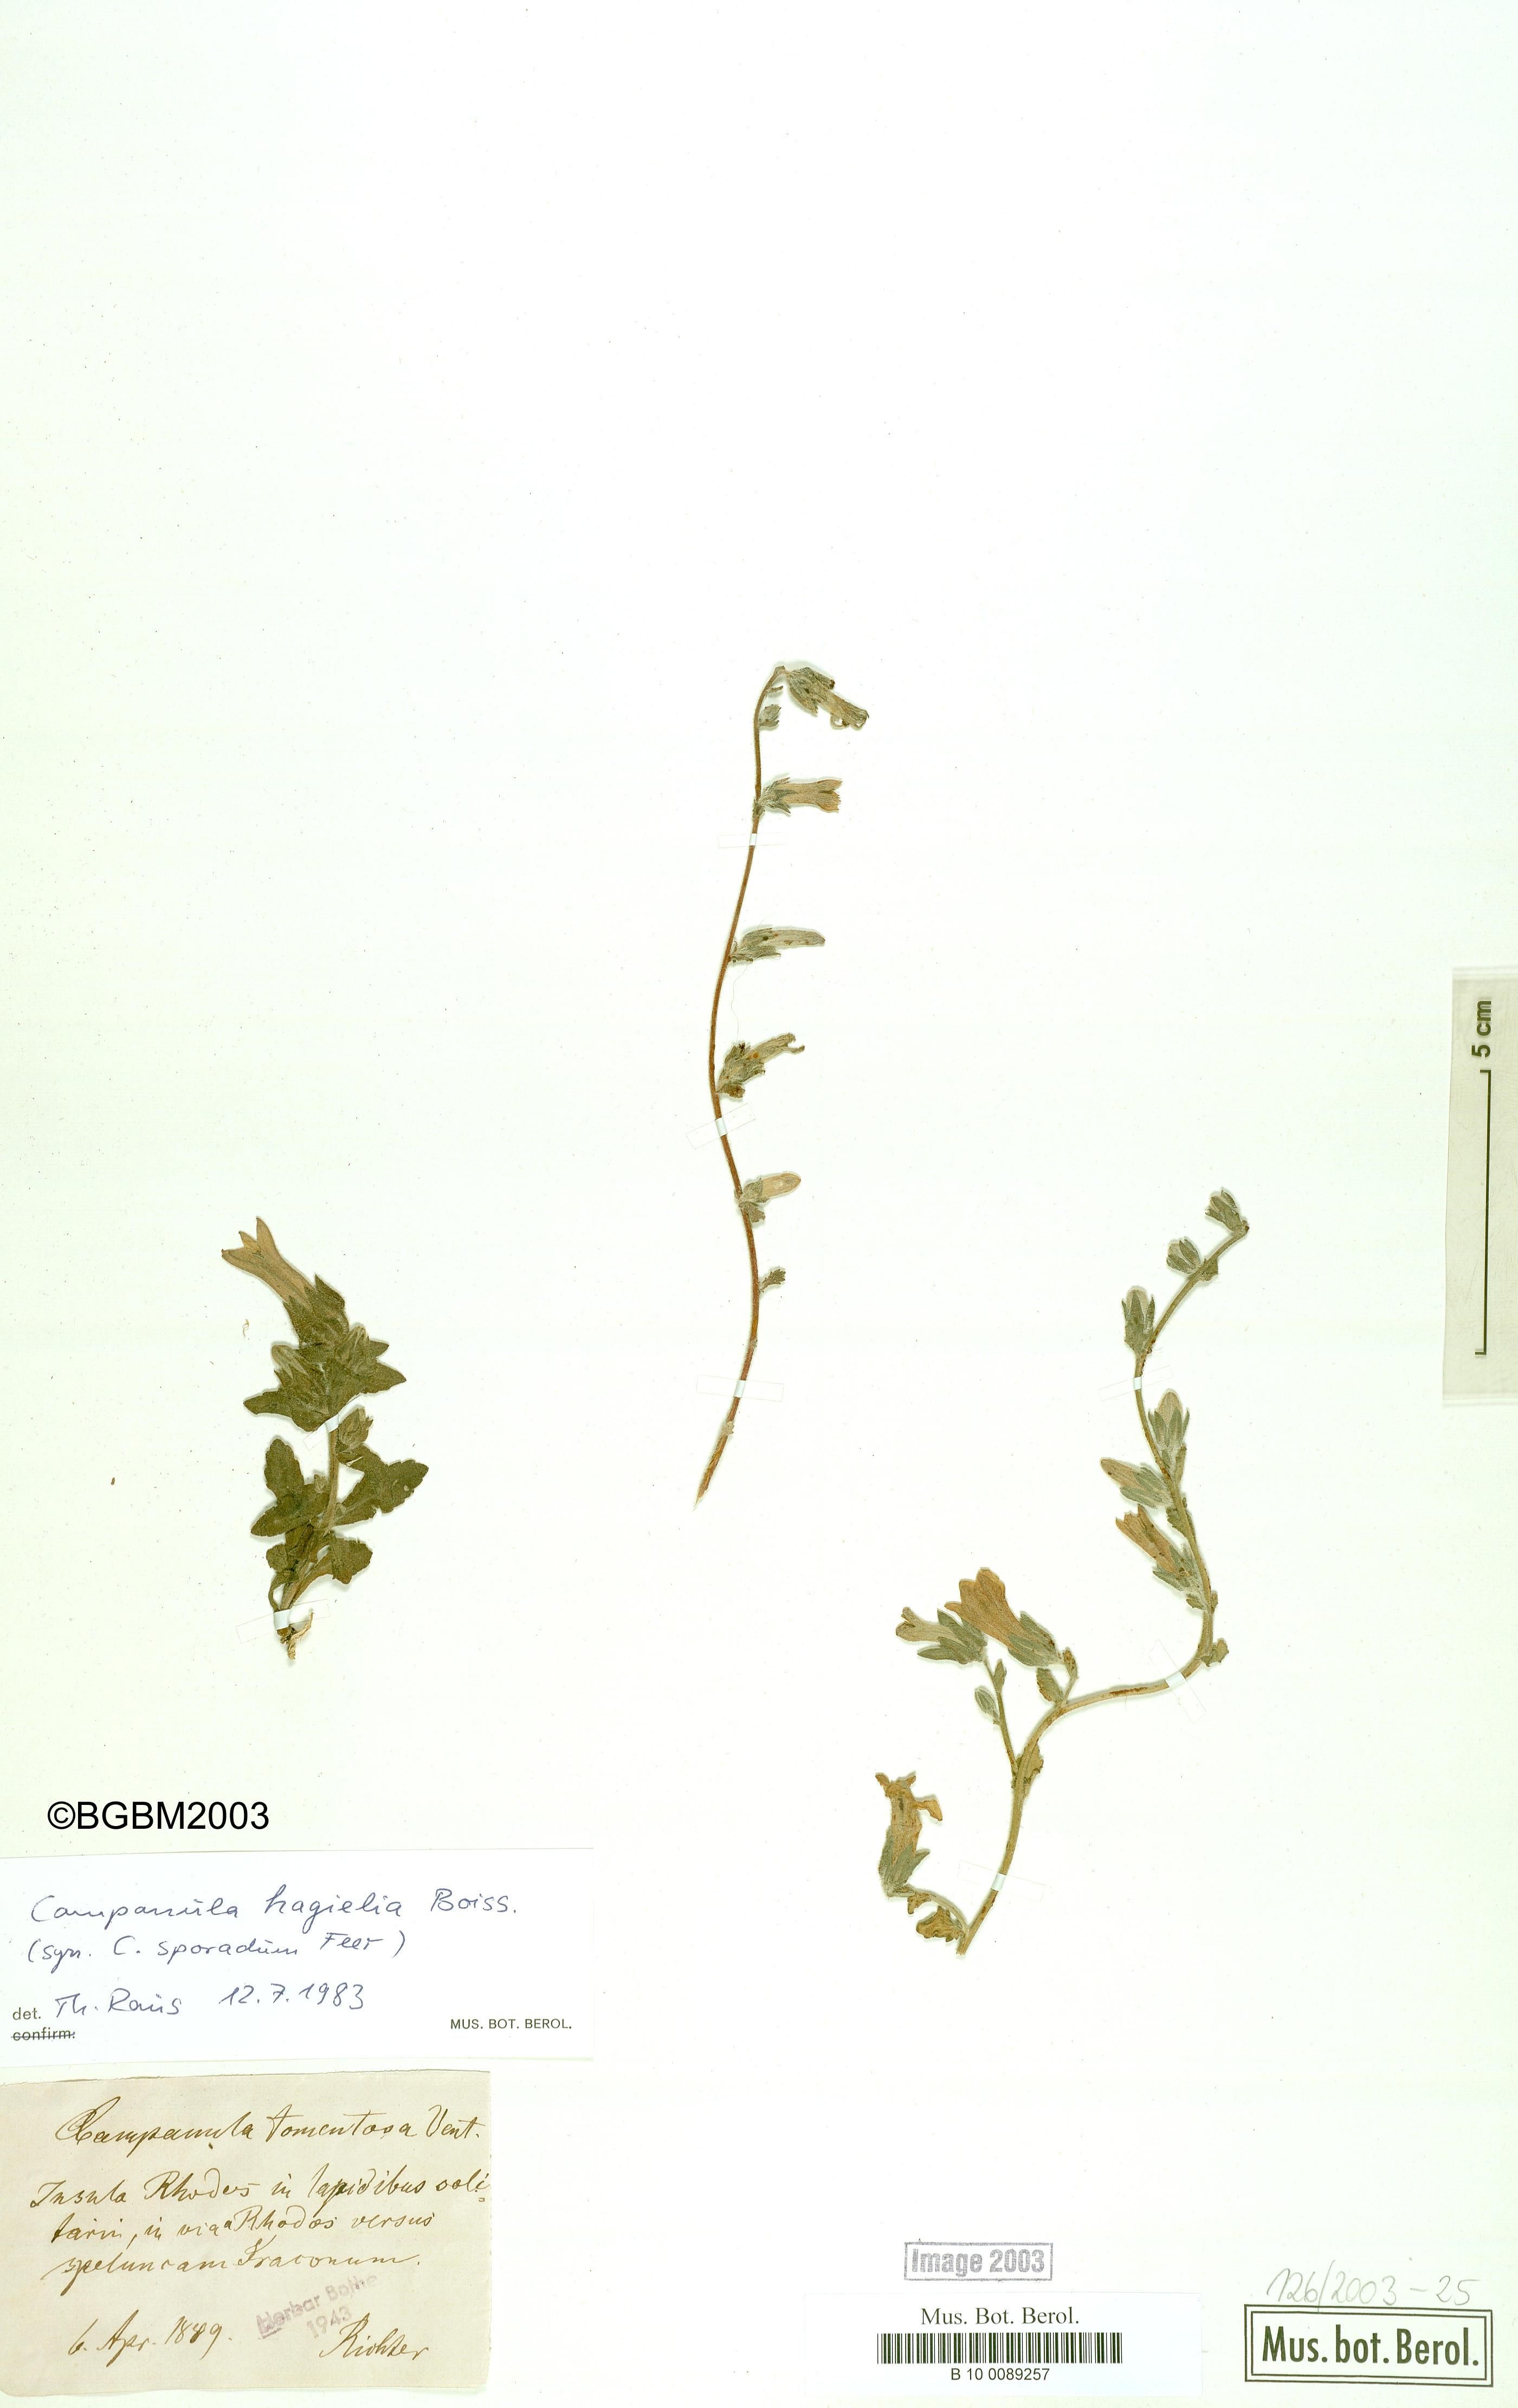 http://ww2.bgbm.org/herbarium/images/B/10/00/89/25/B_10_0089257.jpg